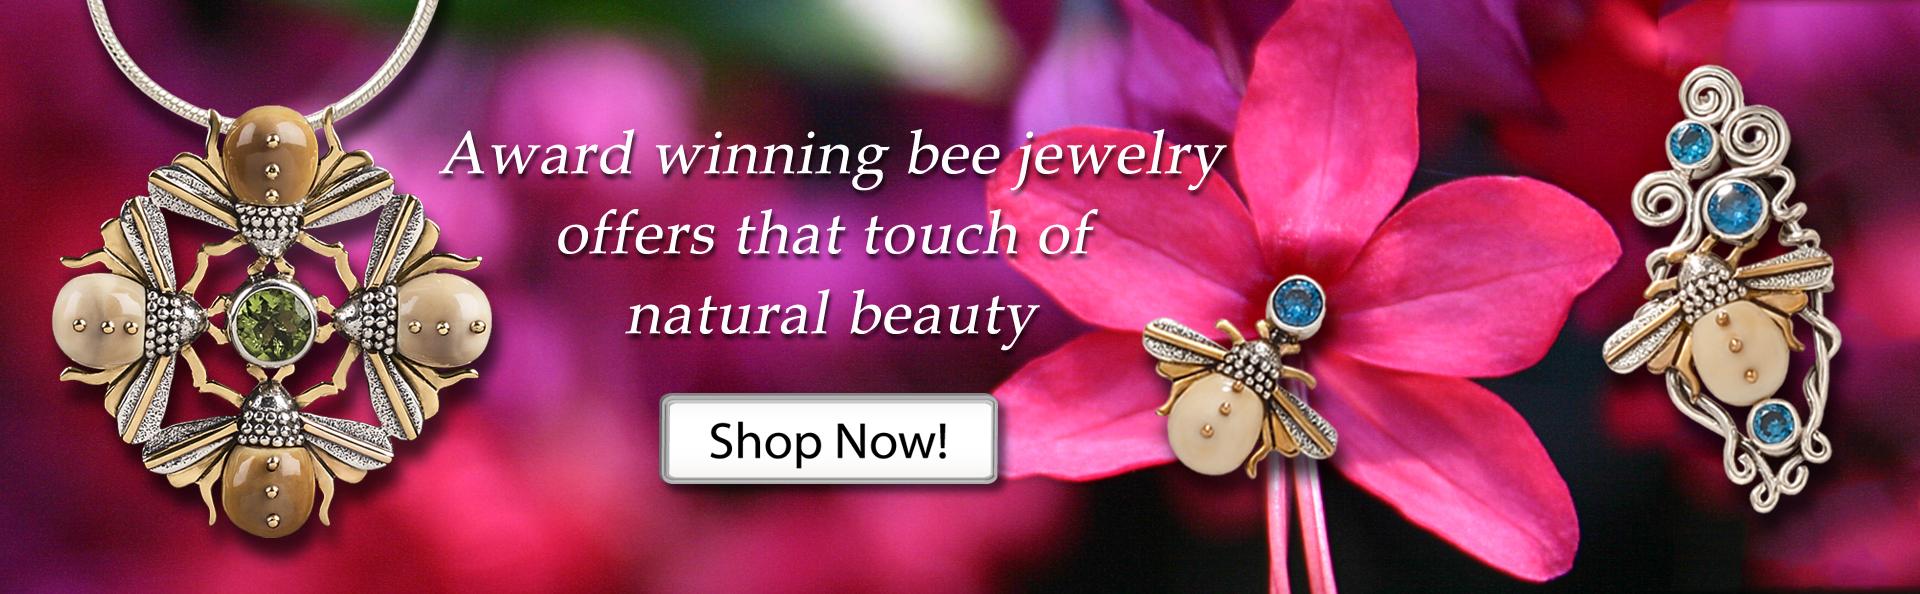 Zealandia silver bee jewelry bee necklace